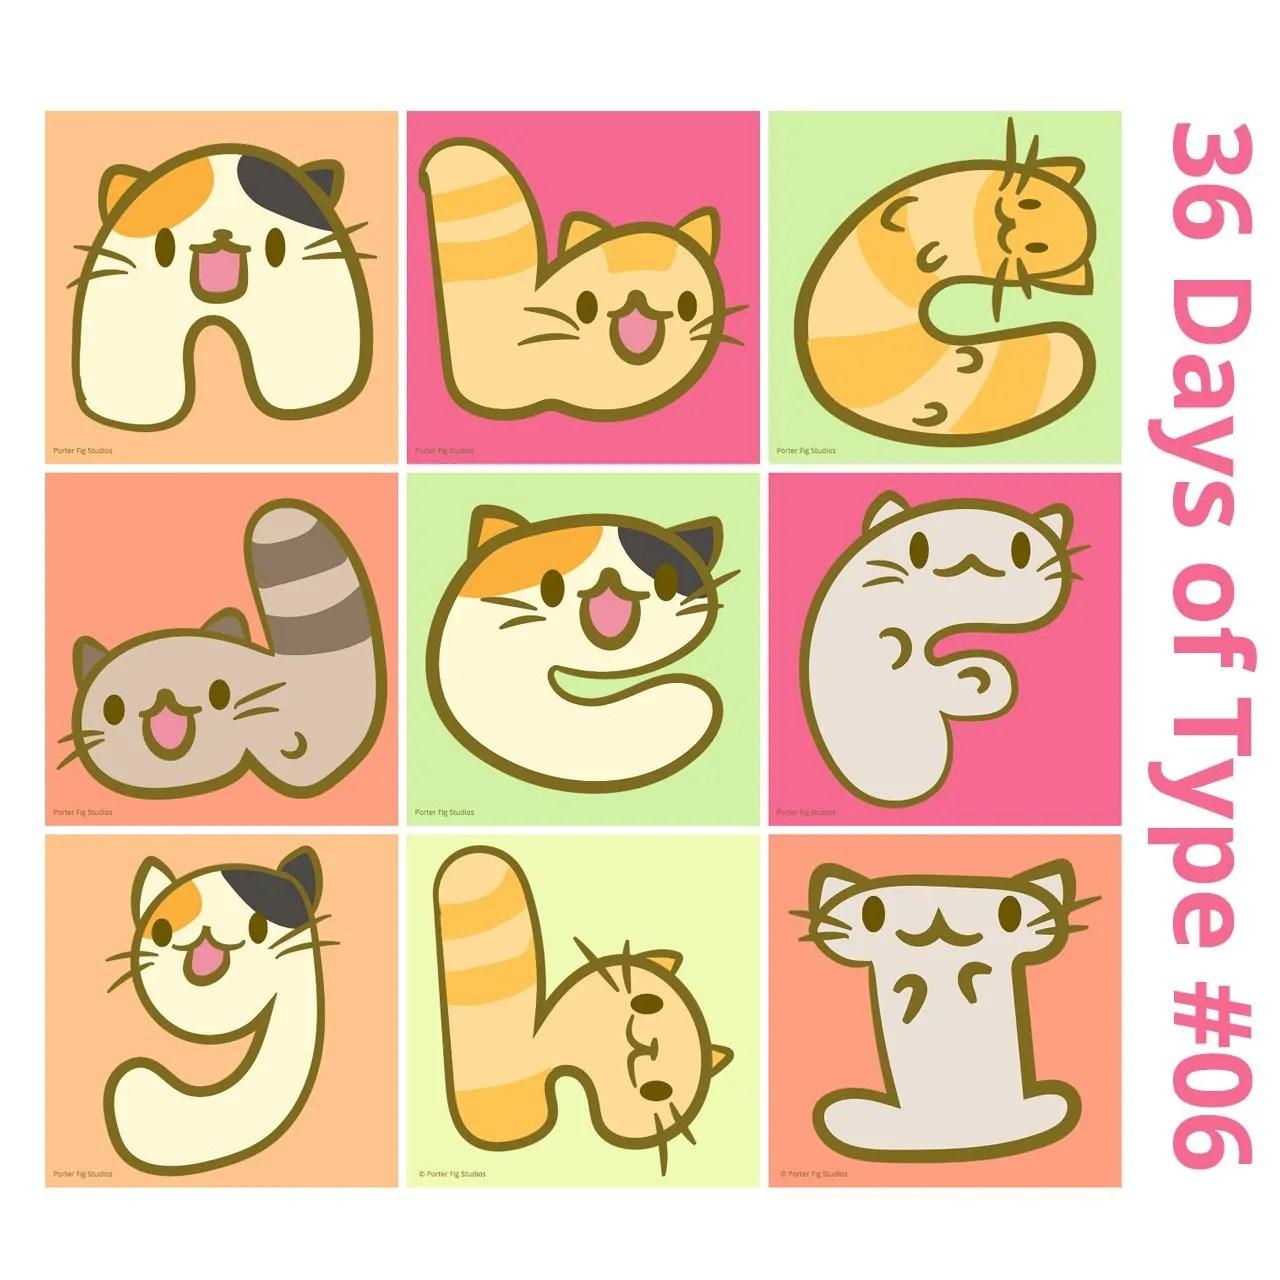 36 days of type 06